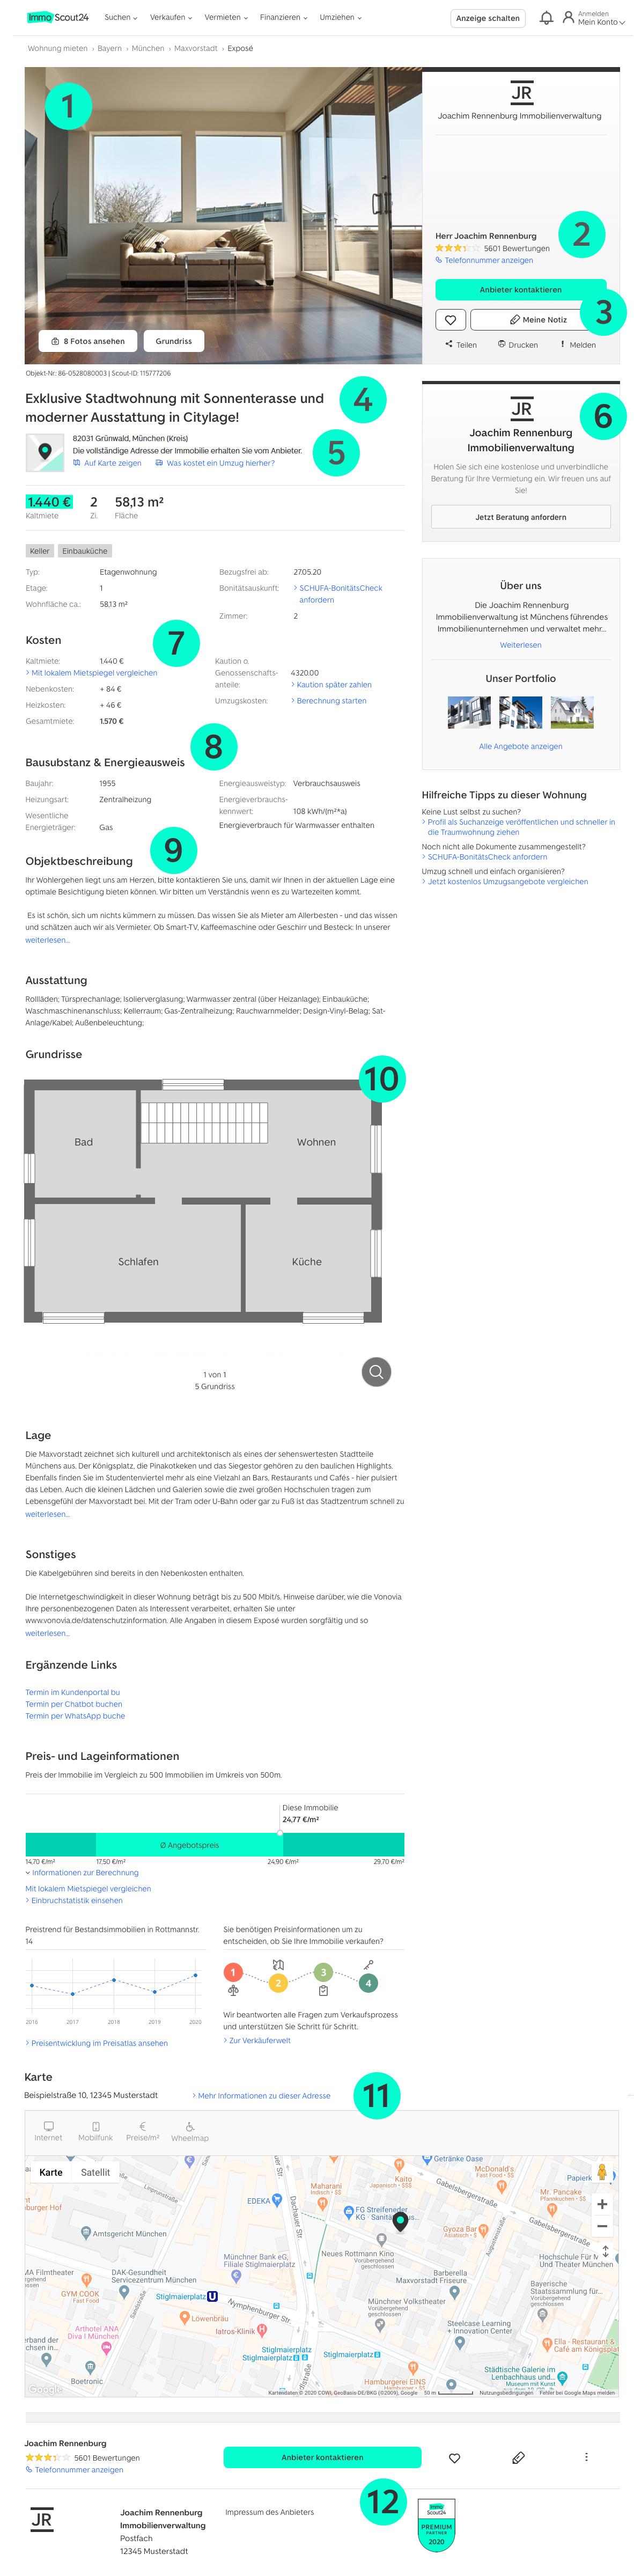 Expose Vorlagen Fur Immobilien Hauser Word